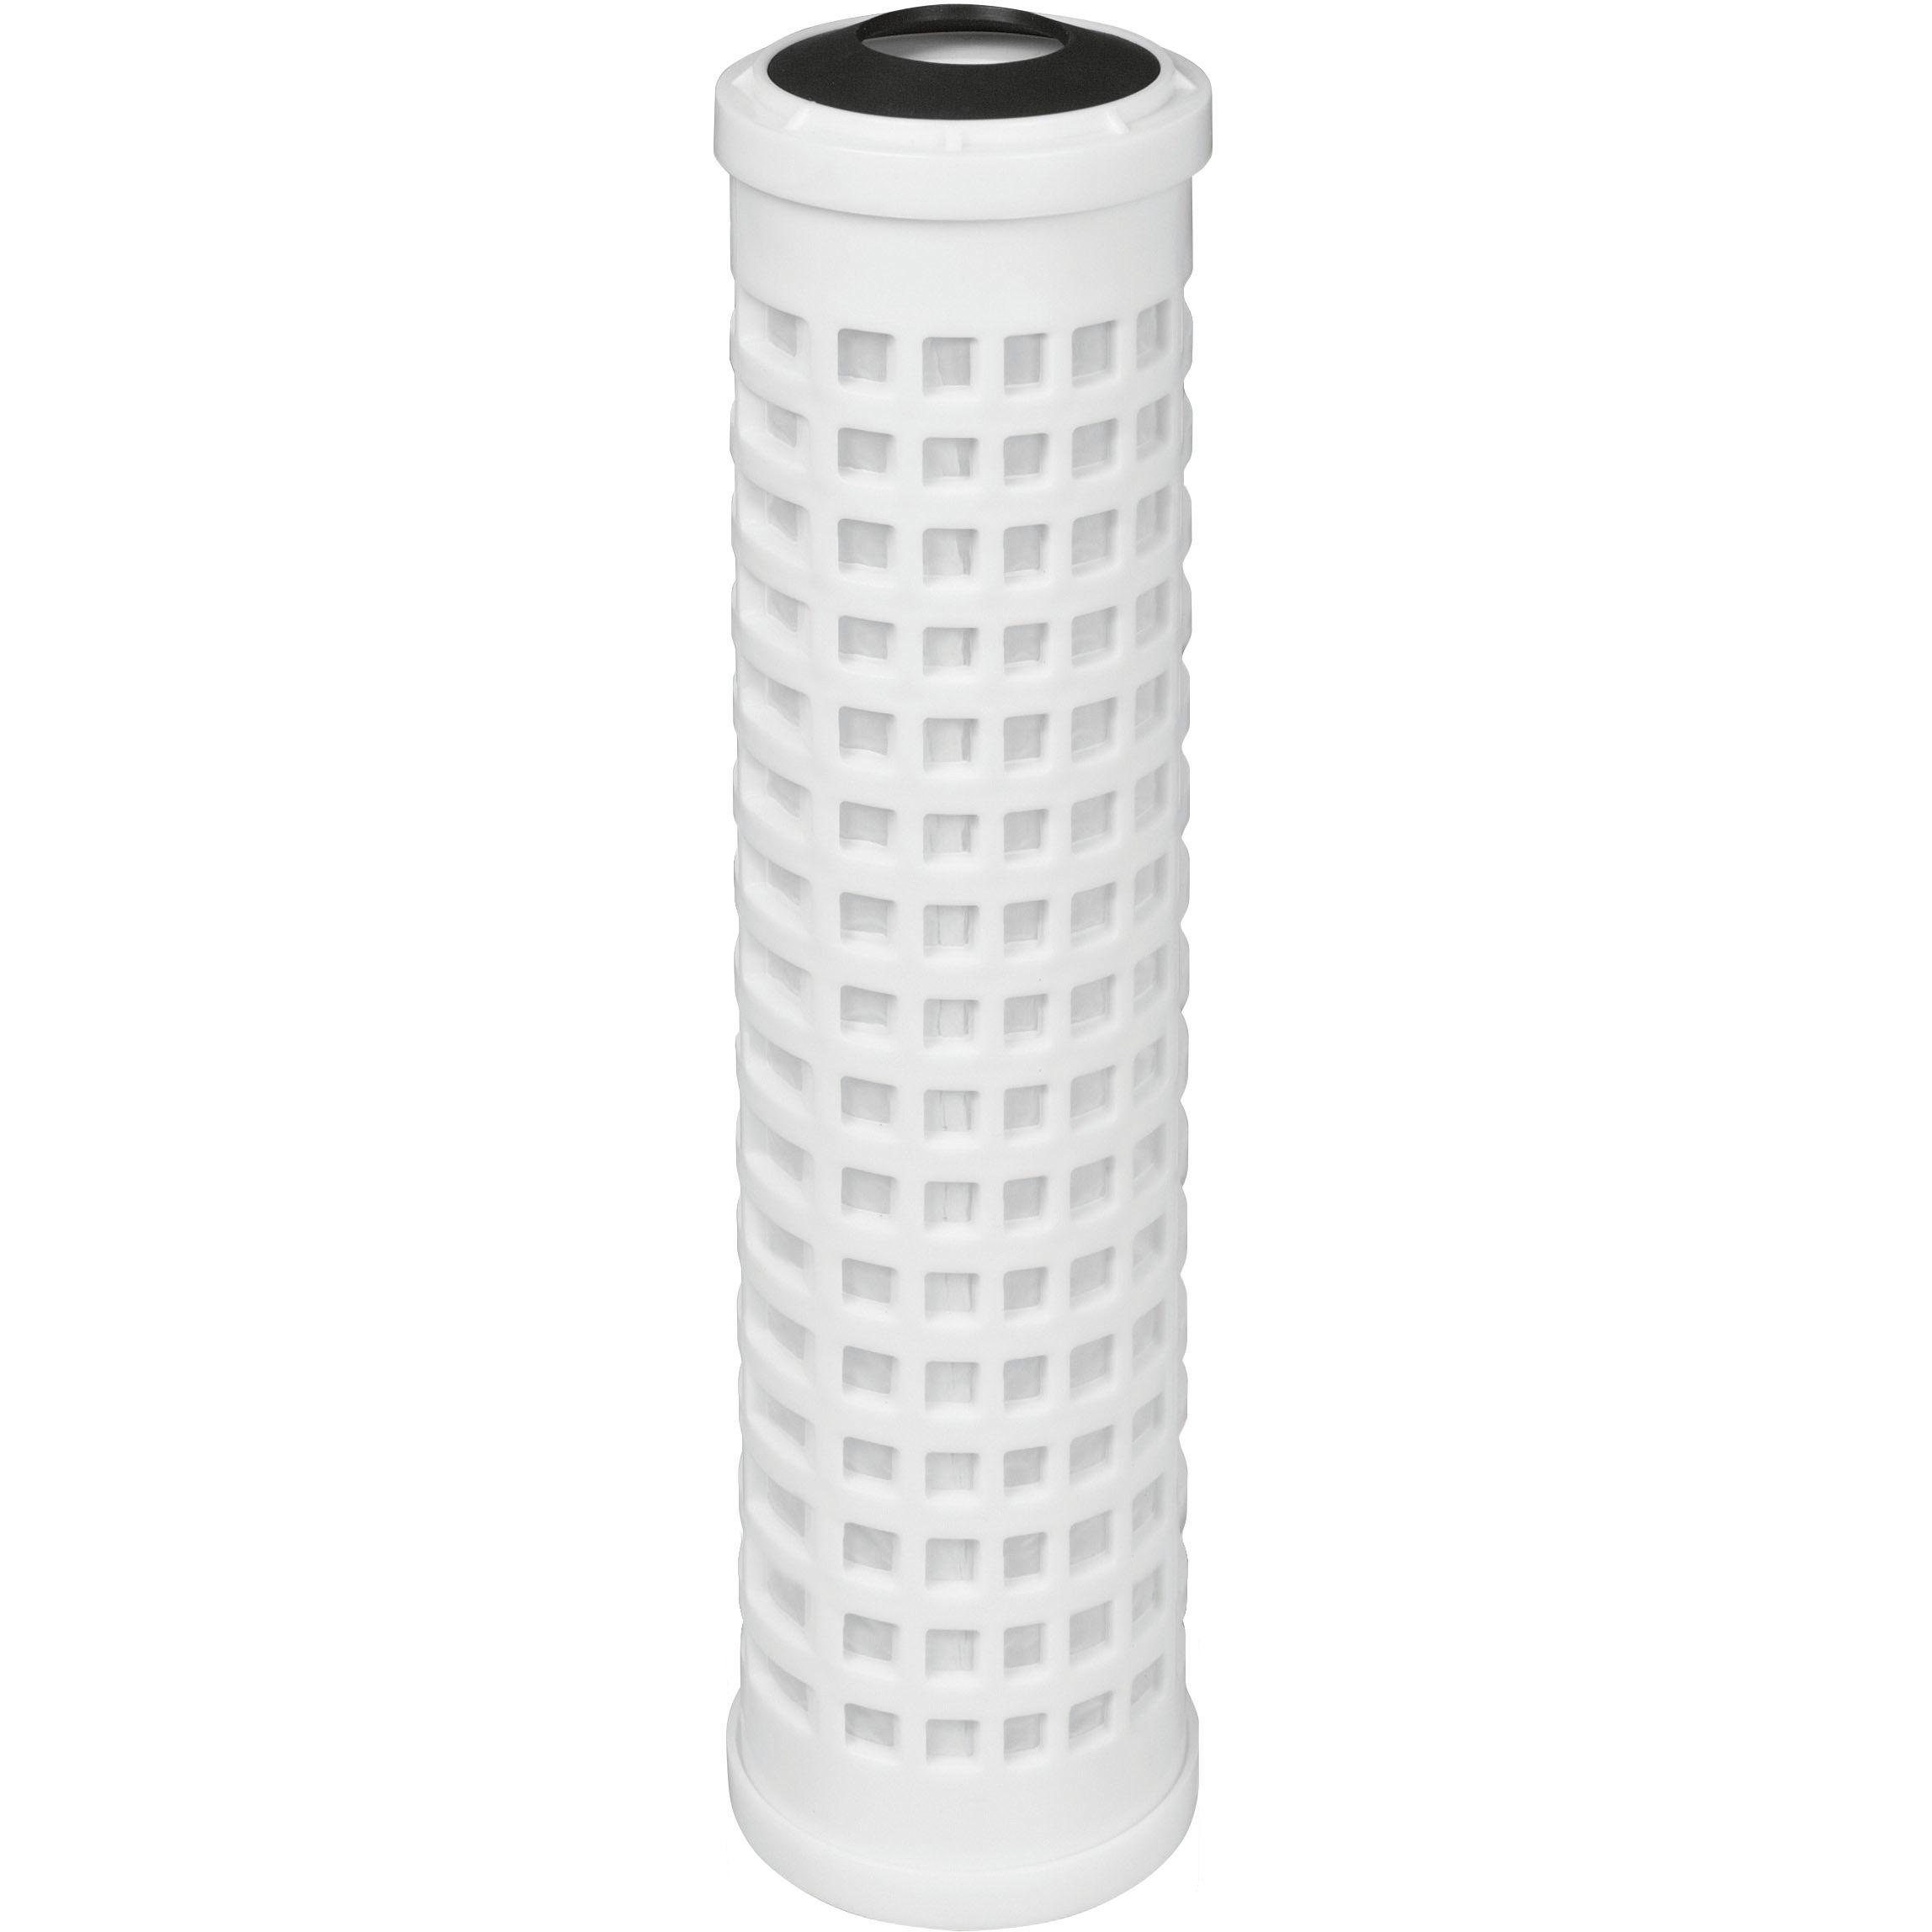 REMS 043054 Finfilterinsats 90 mikrometer